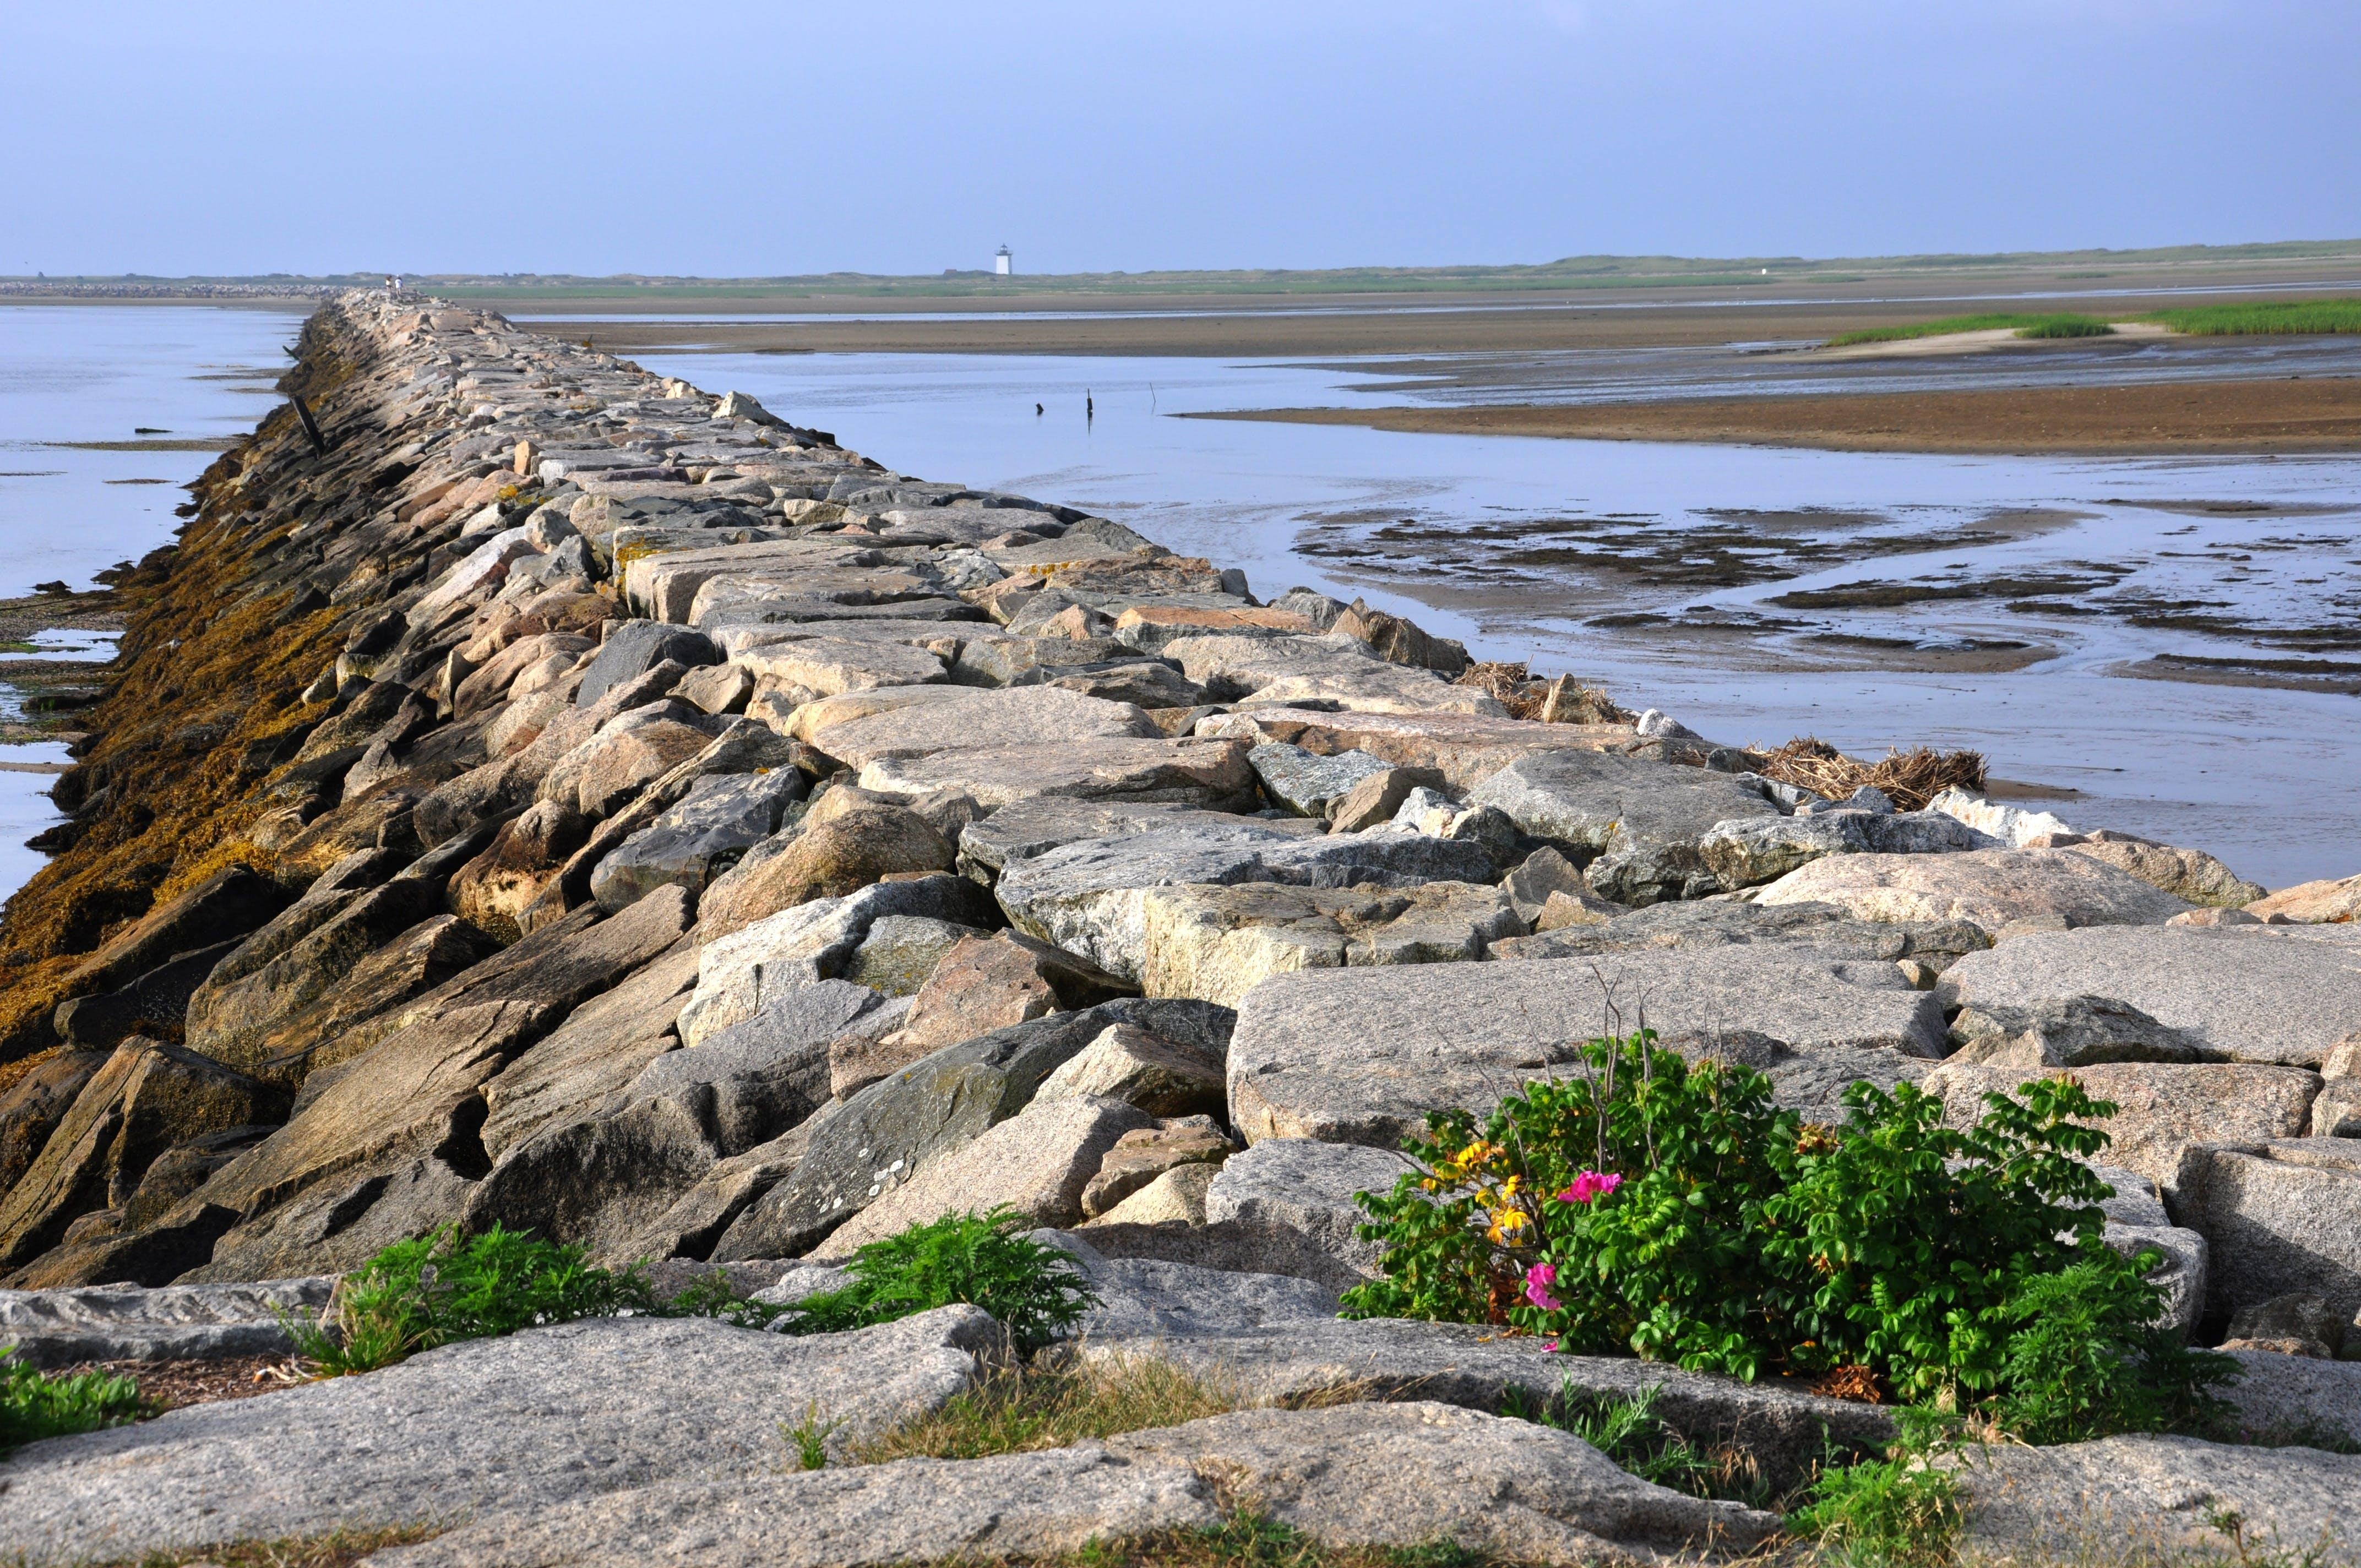 Stone Sea Dock